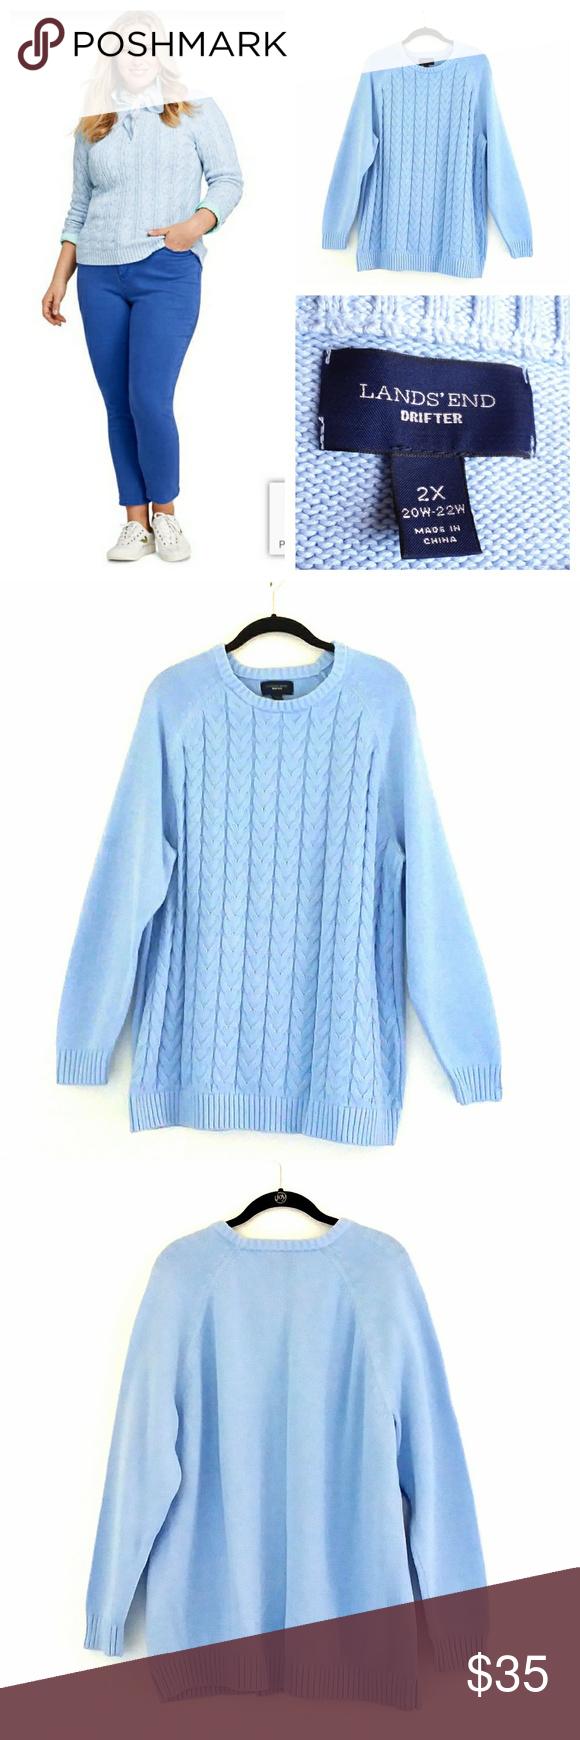 Nwot Lands End Drifter 100 Cotton Sweater 2x Cotton Sweater Clothes Design Sweaters [ 1740 x 580 Pixel ]